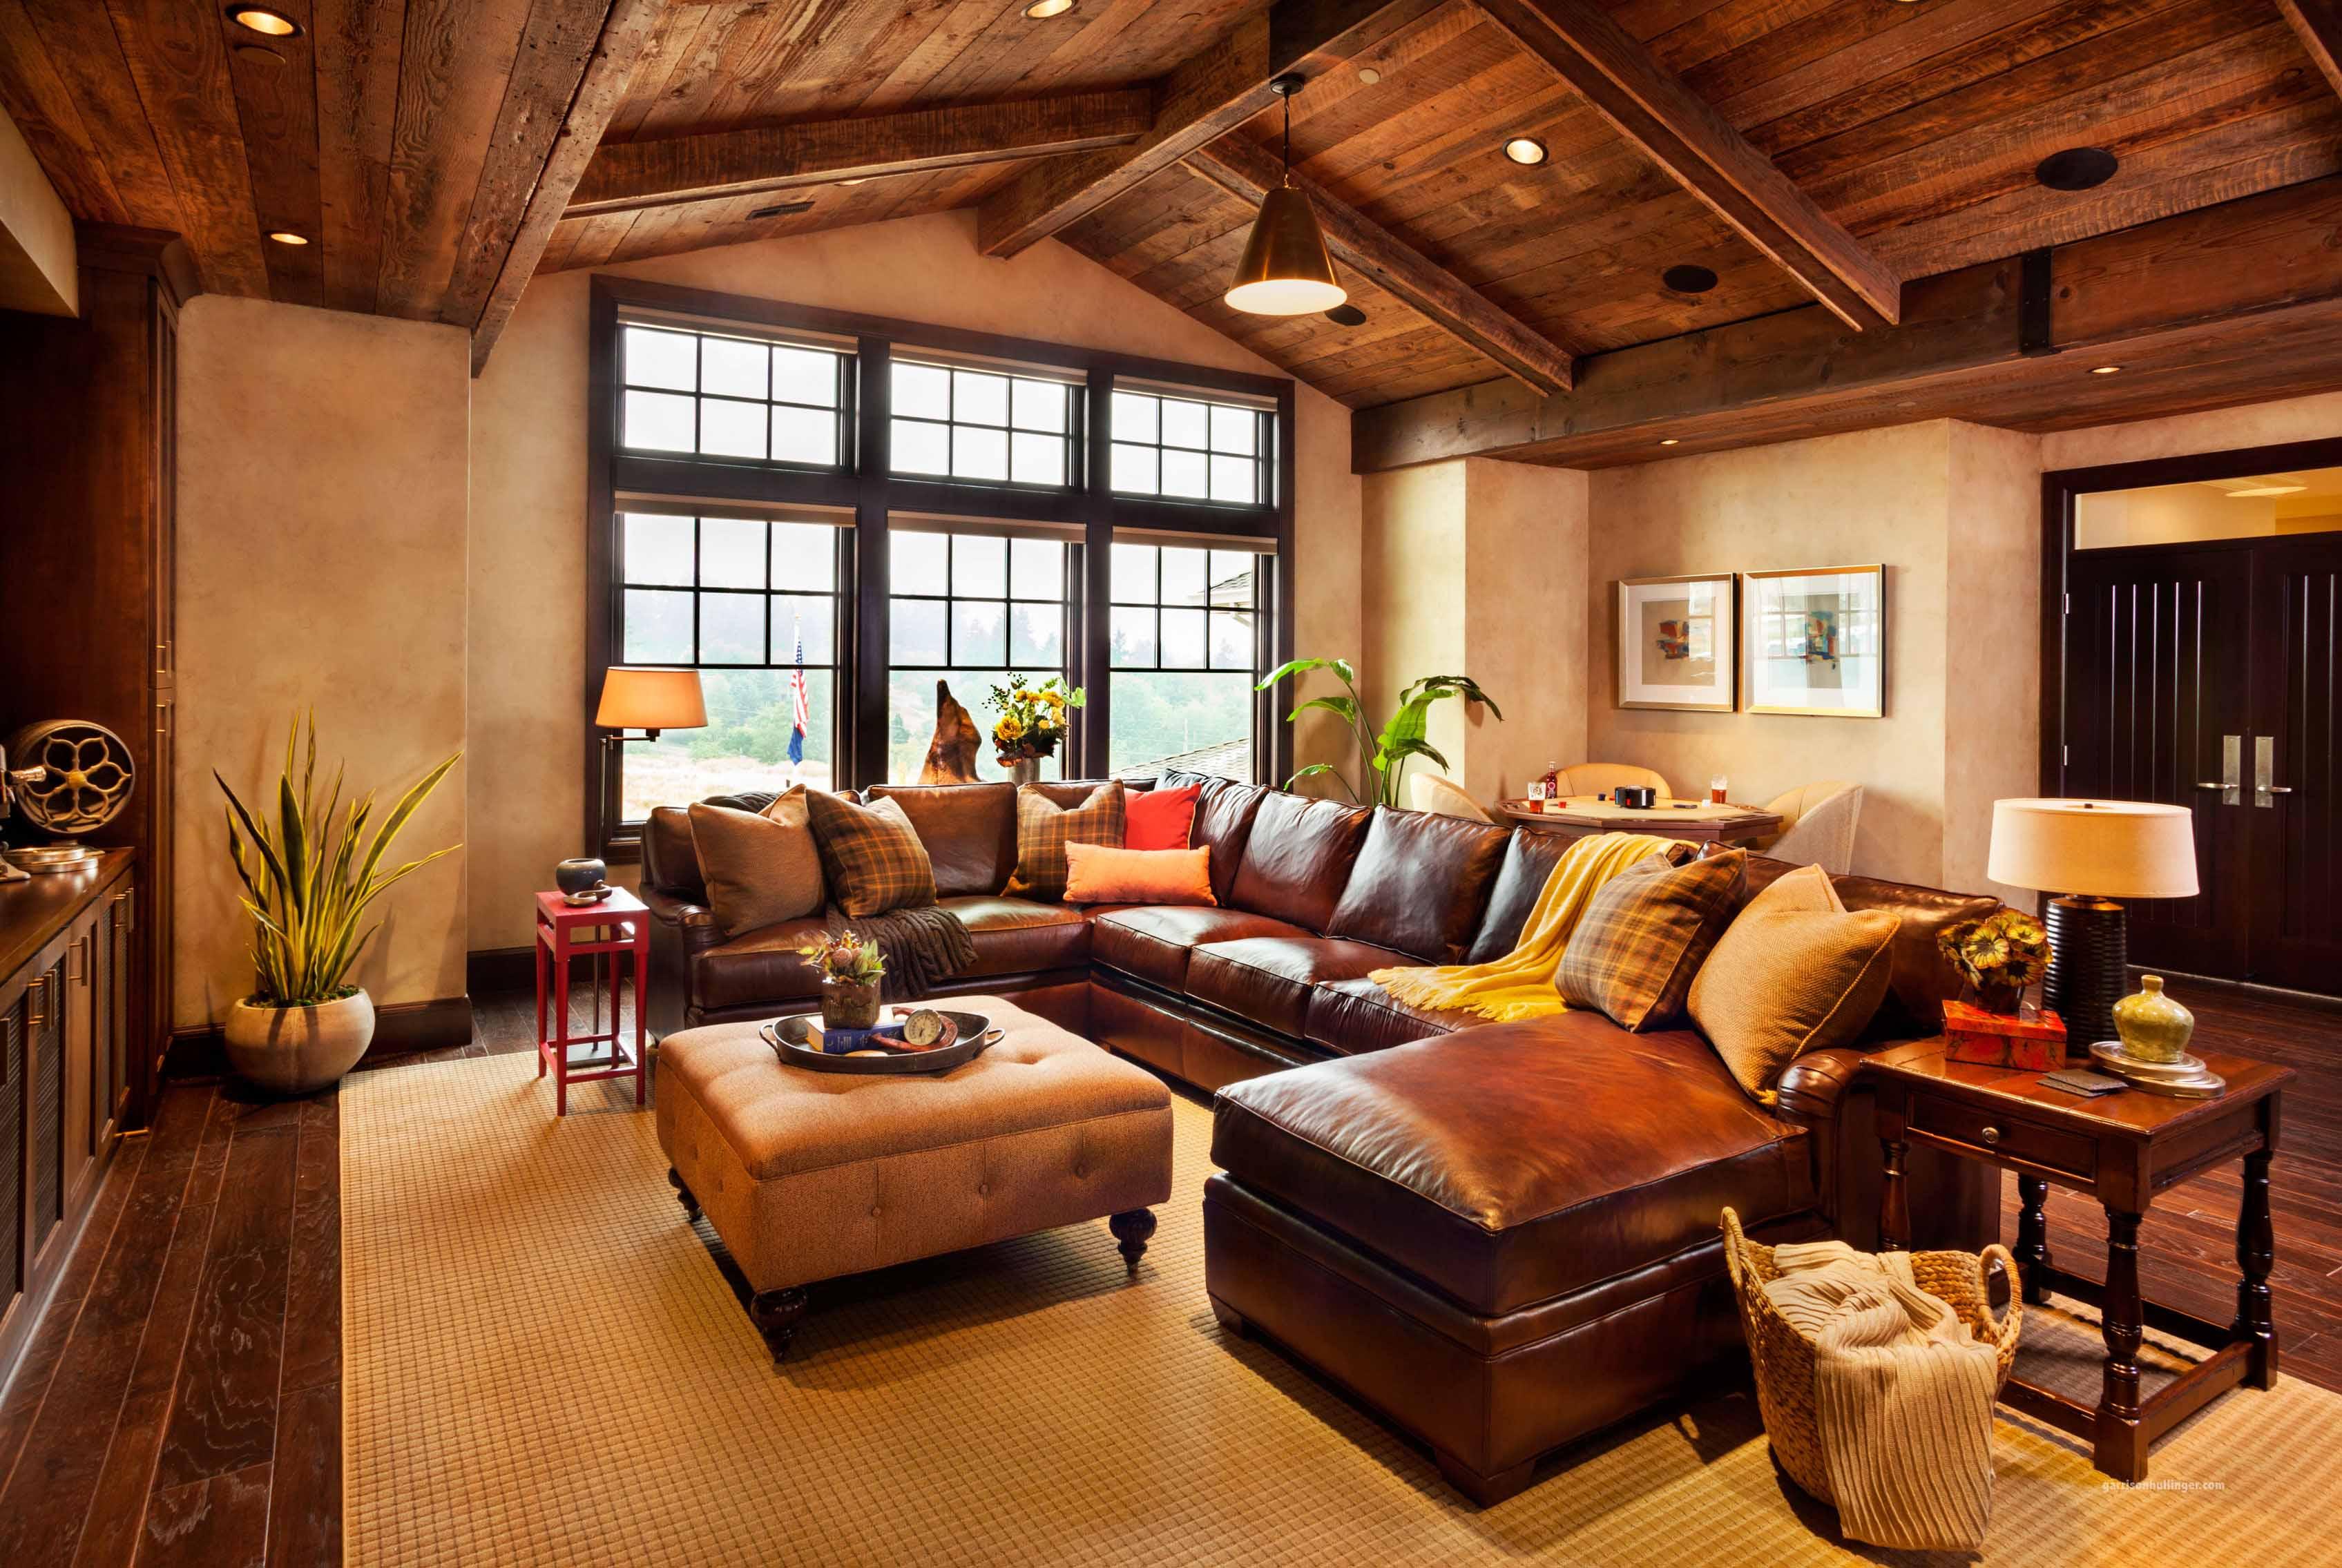 Attic Living Room attic living room archives - architecture art designs